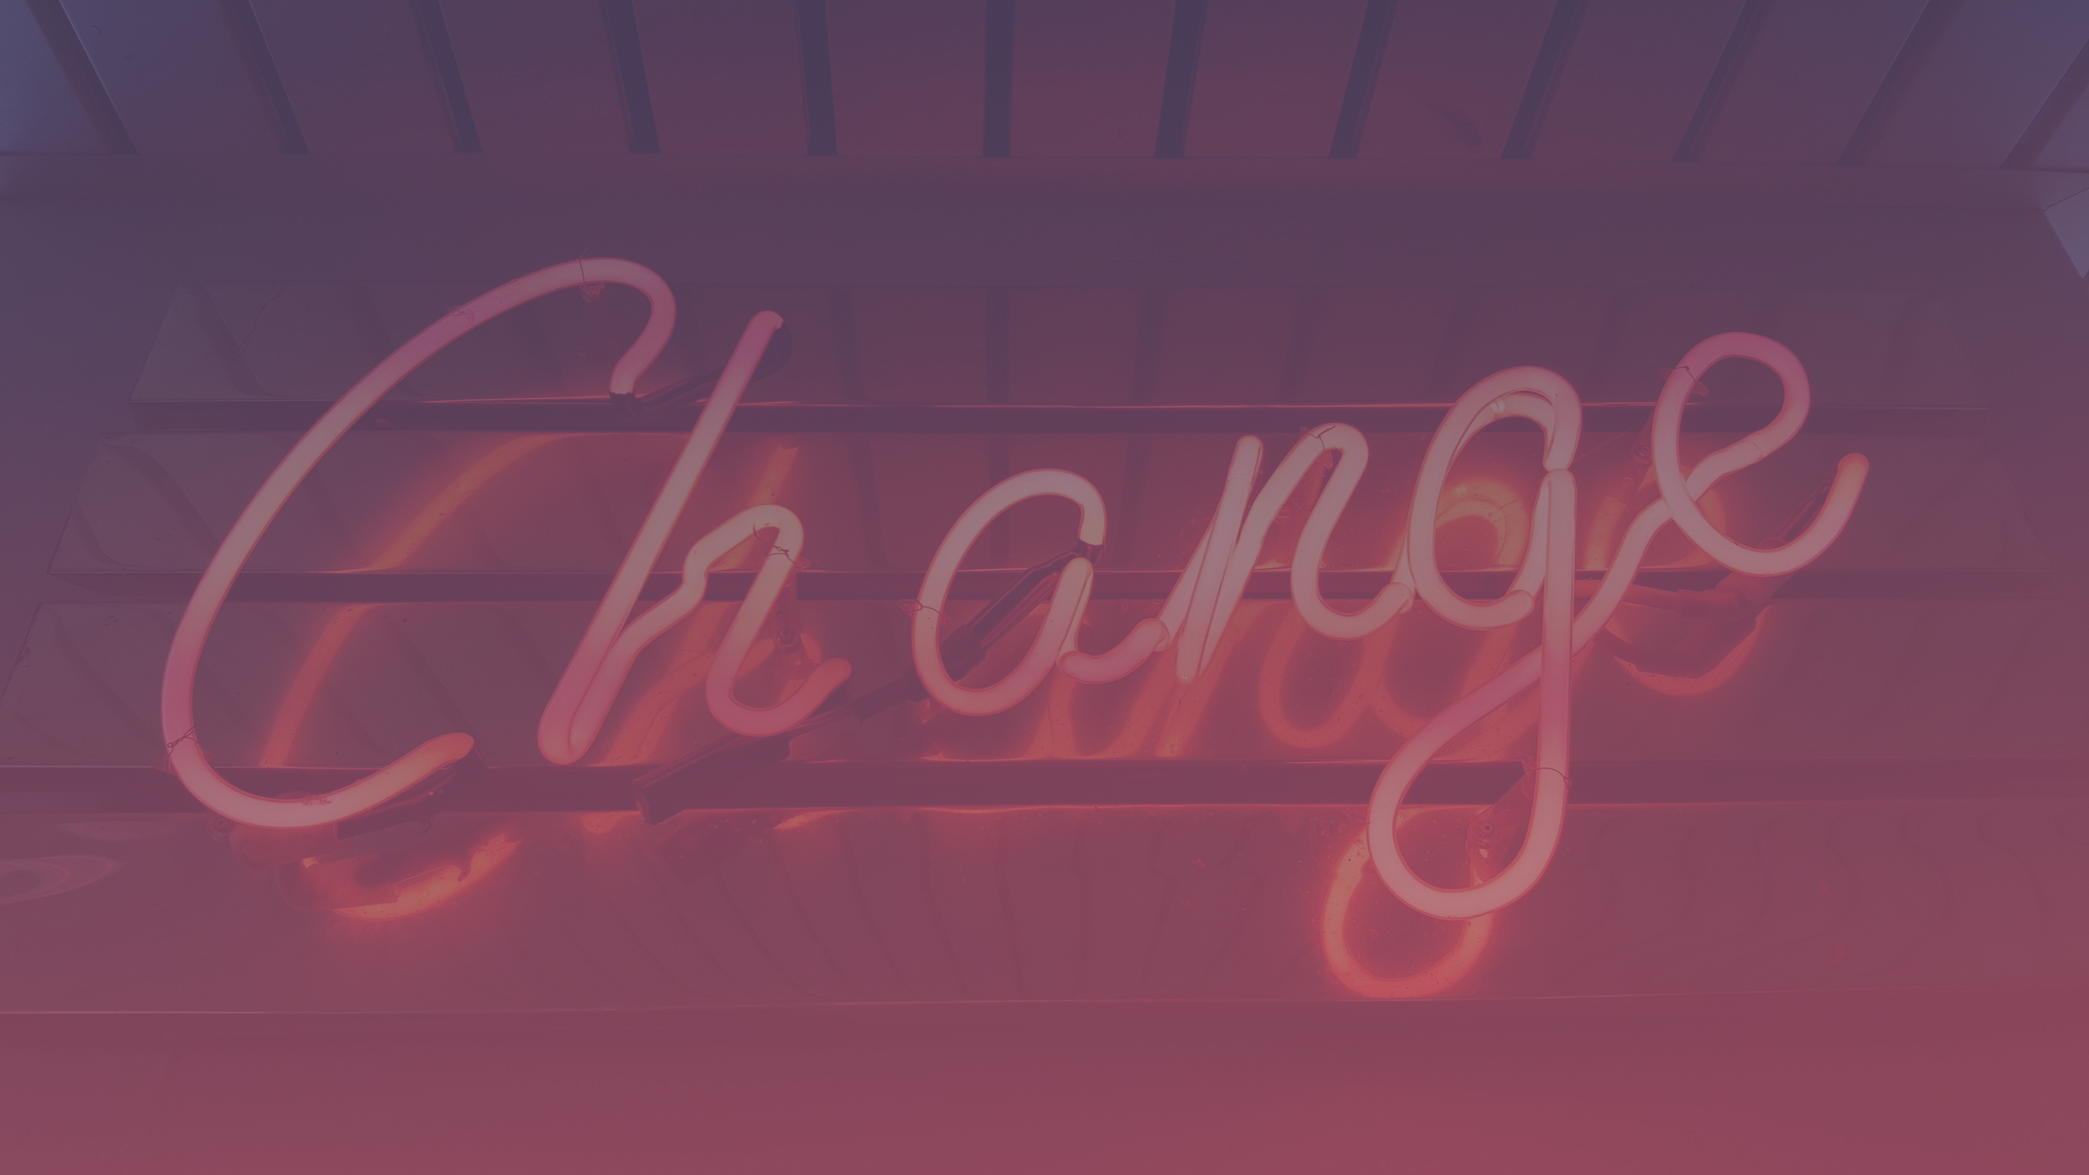 Change – Inspire ancre le changement